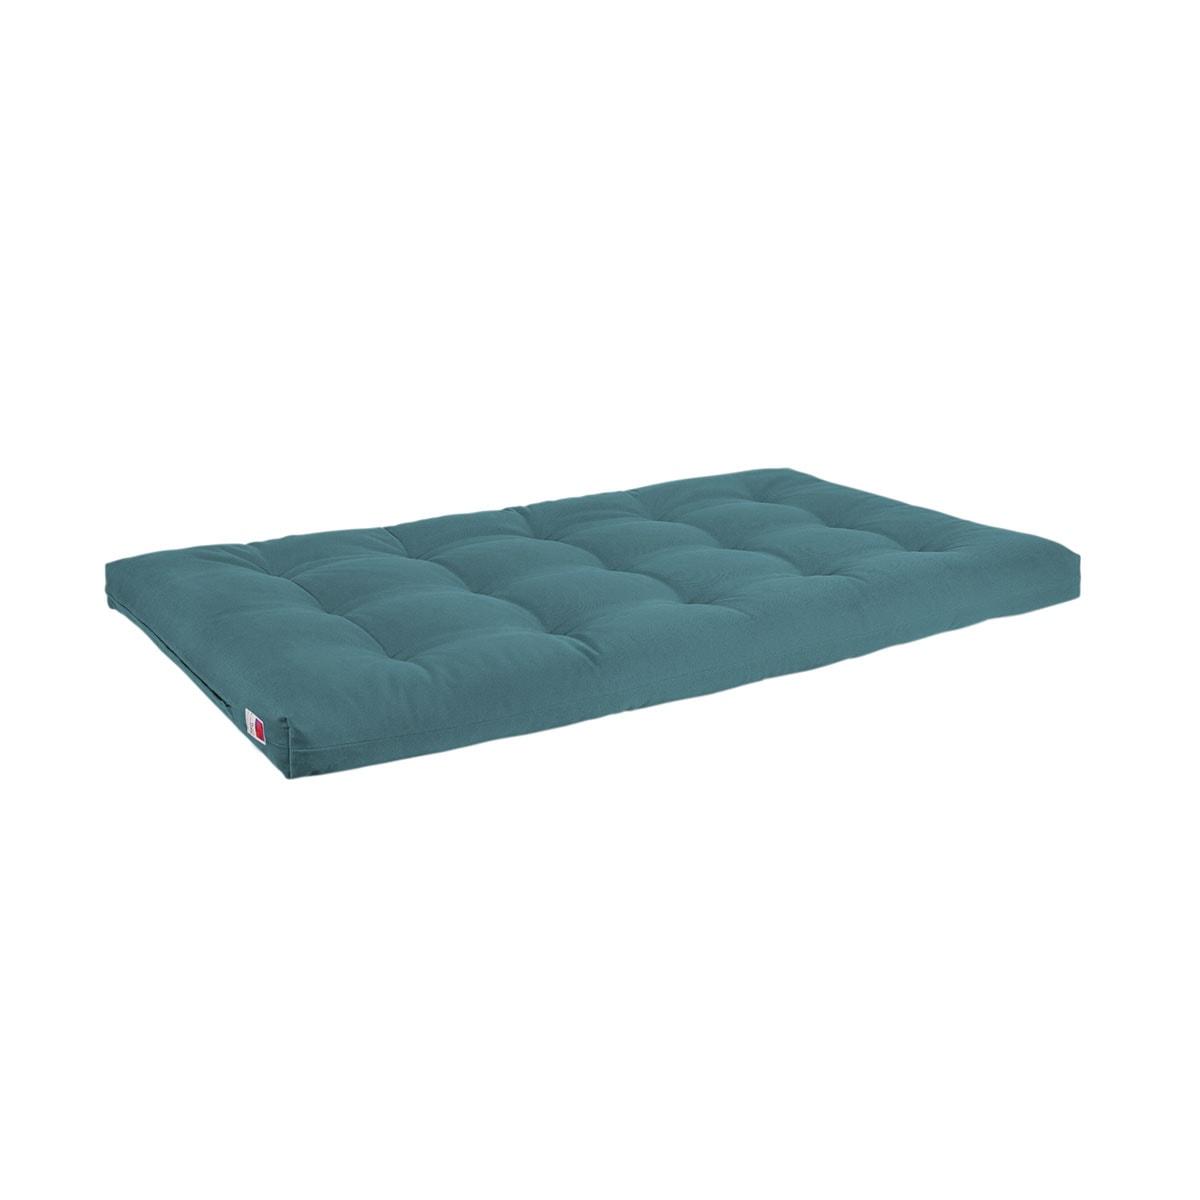 futon bebe futon company. Black Bedroom Furniture Sets. Home Design Ideas